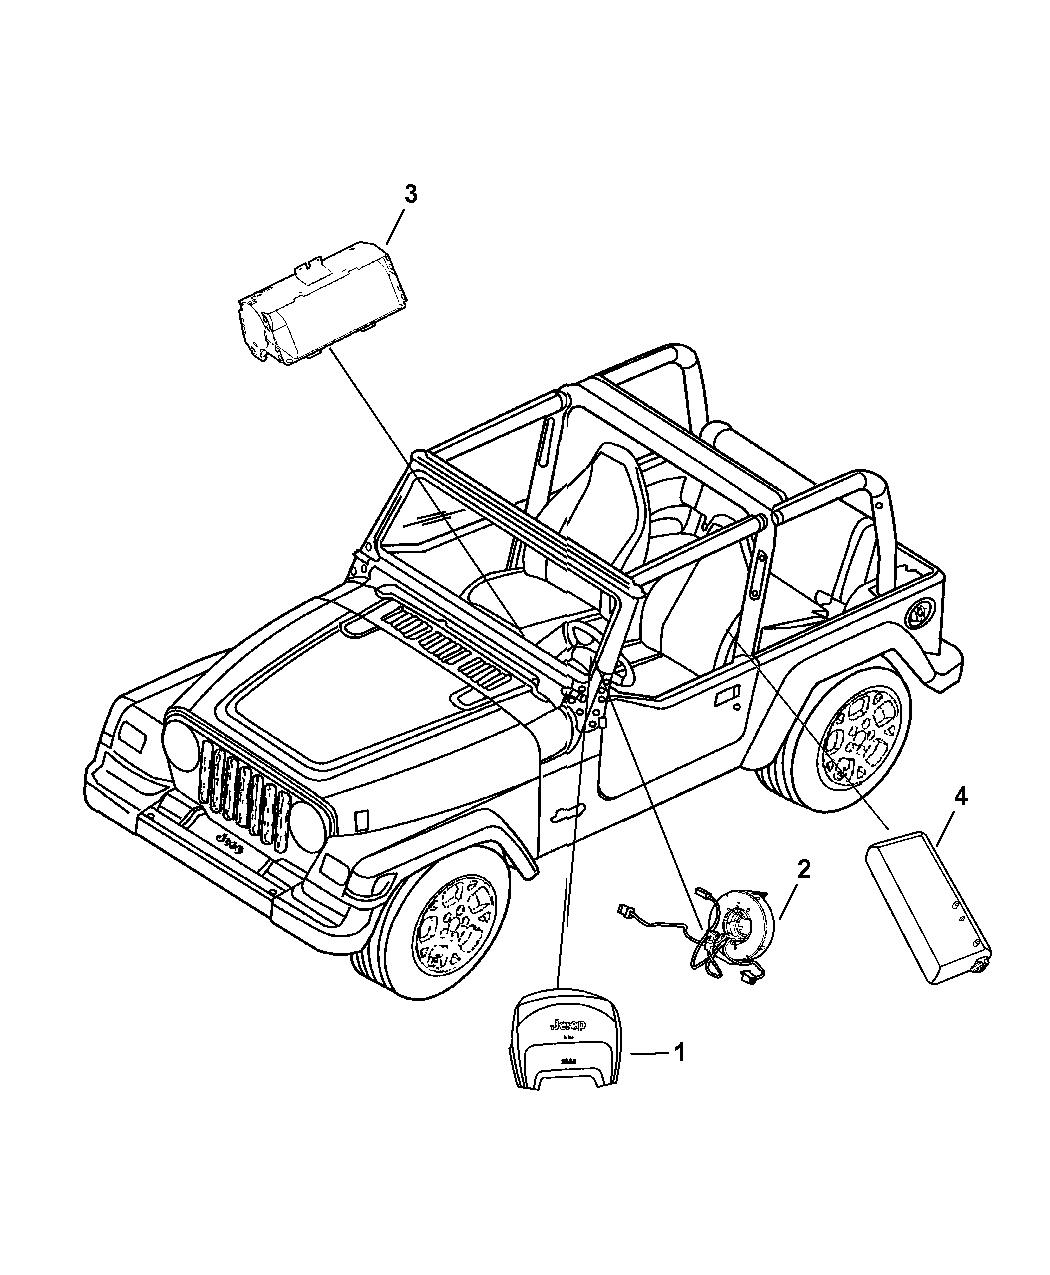 2007 Jeep Wrangler Air Bags & Clock Spring - Mopar Parts Giant Jeep Tj Clock Spring Wiring Diagram on